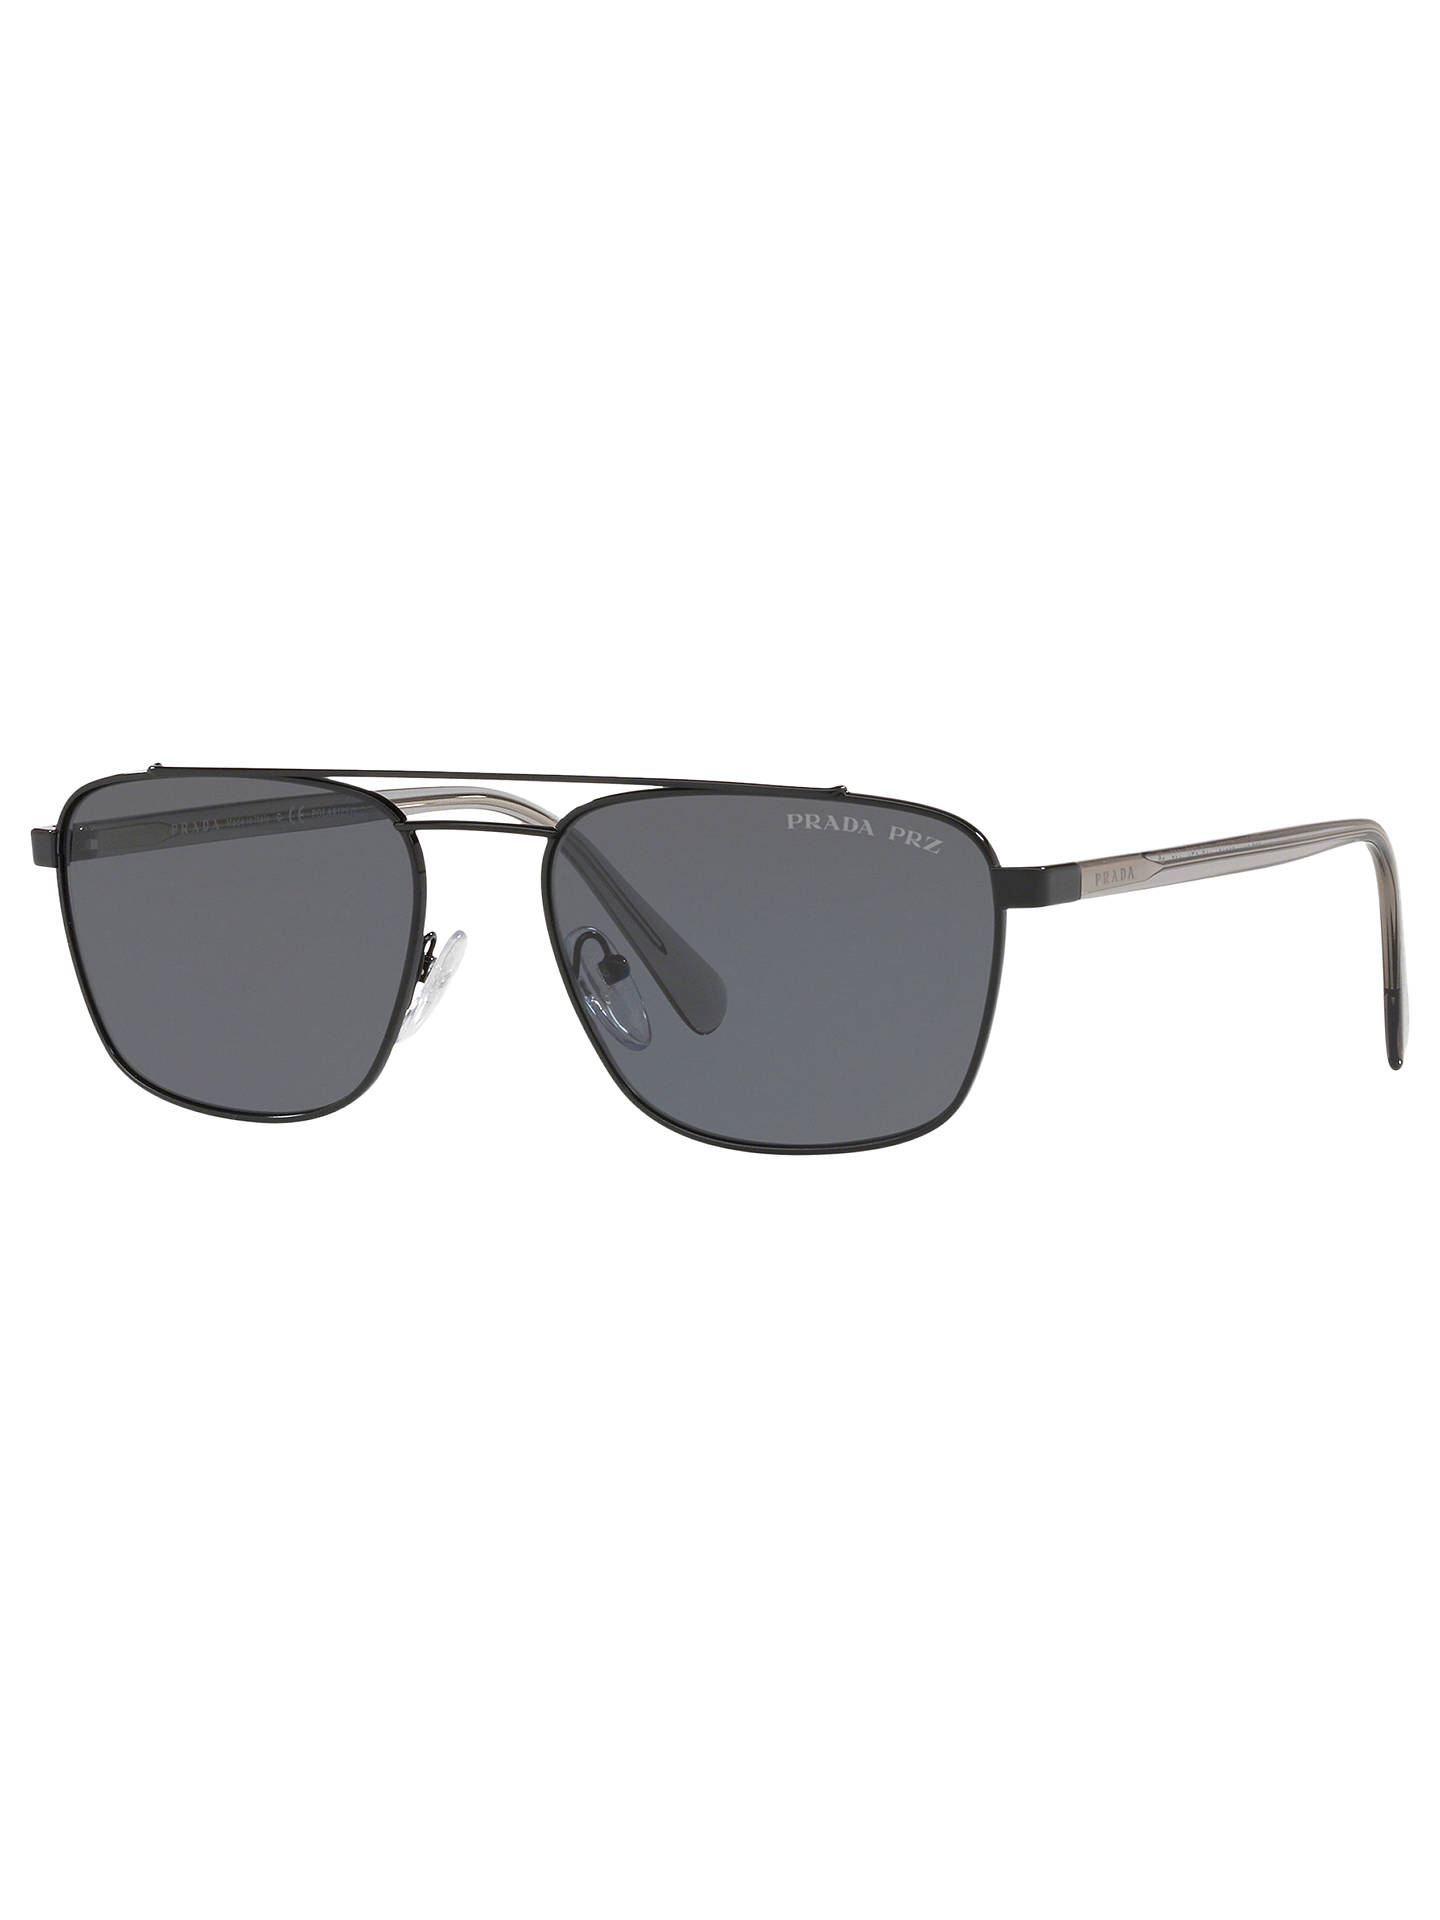 eeb16066a1 ... australia buyprada pr 61us mens polarised square sunglasses black grey  online at johnlewis. 3bc1b 345af